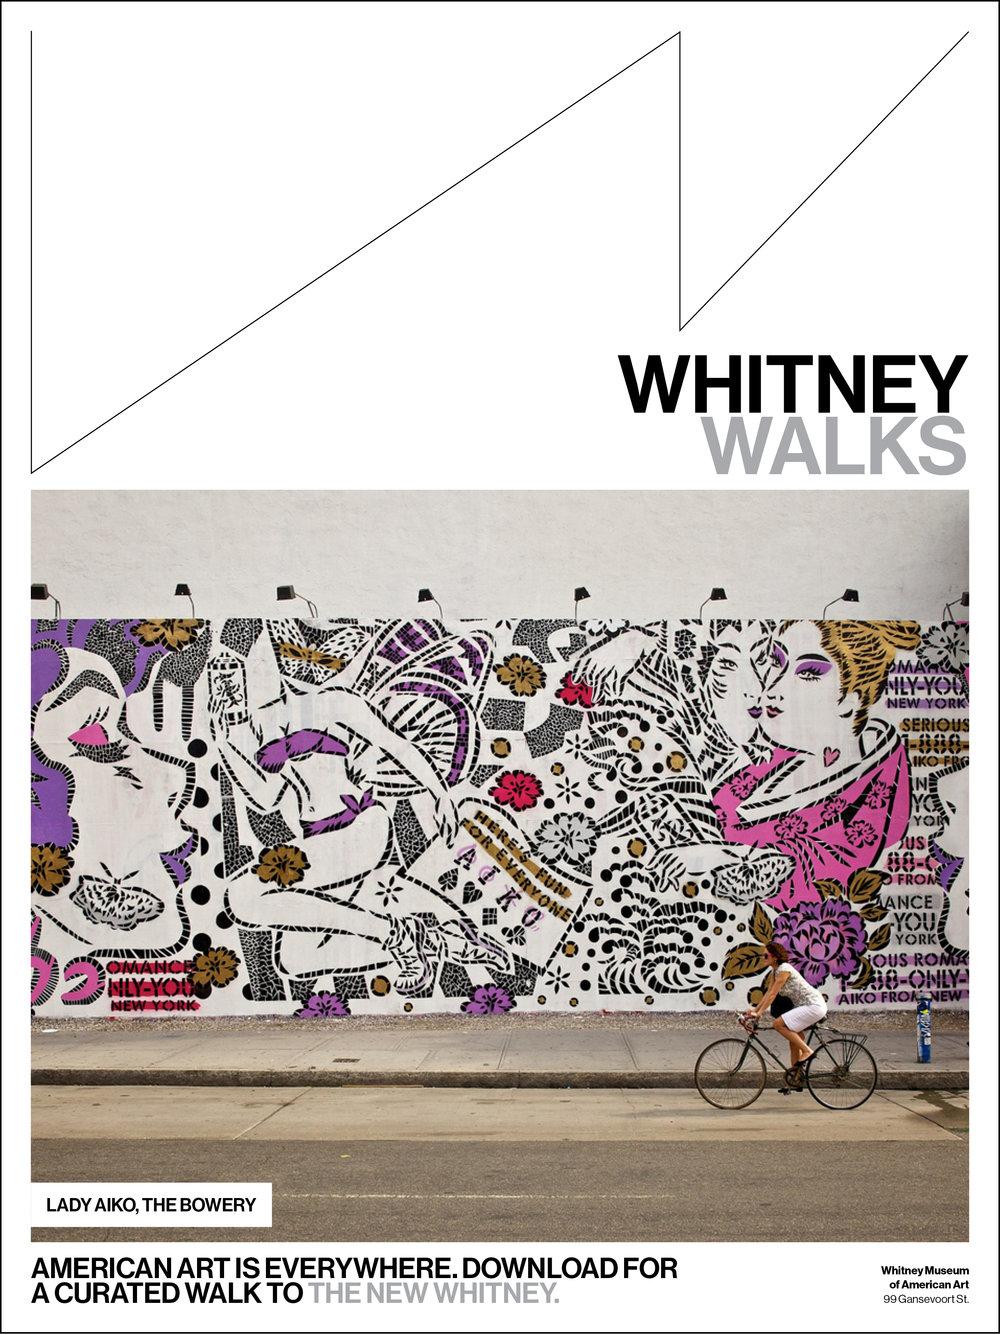 Whitney_WhitneyWalks_Print3-1.jpg